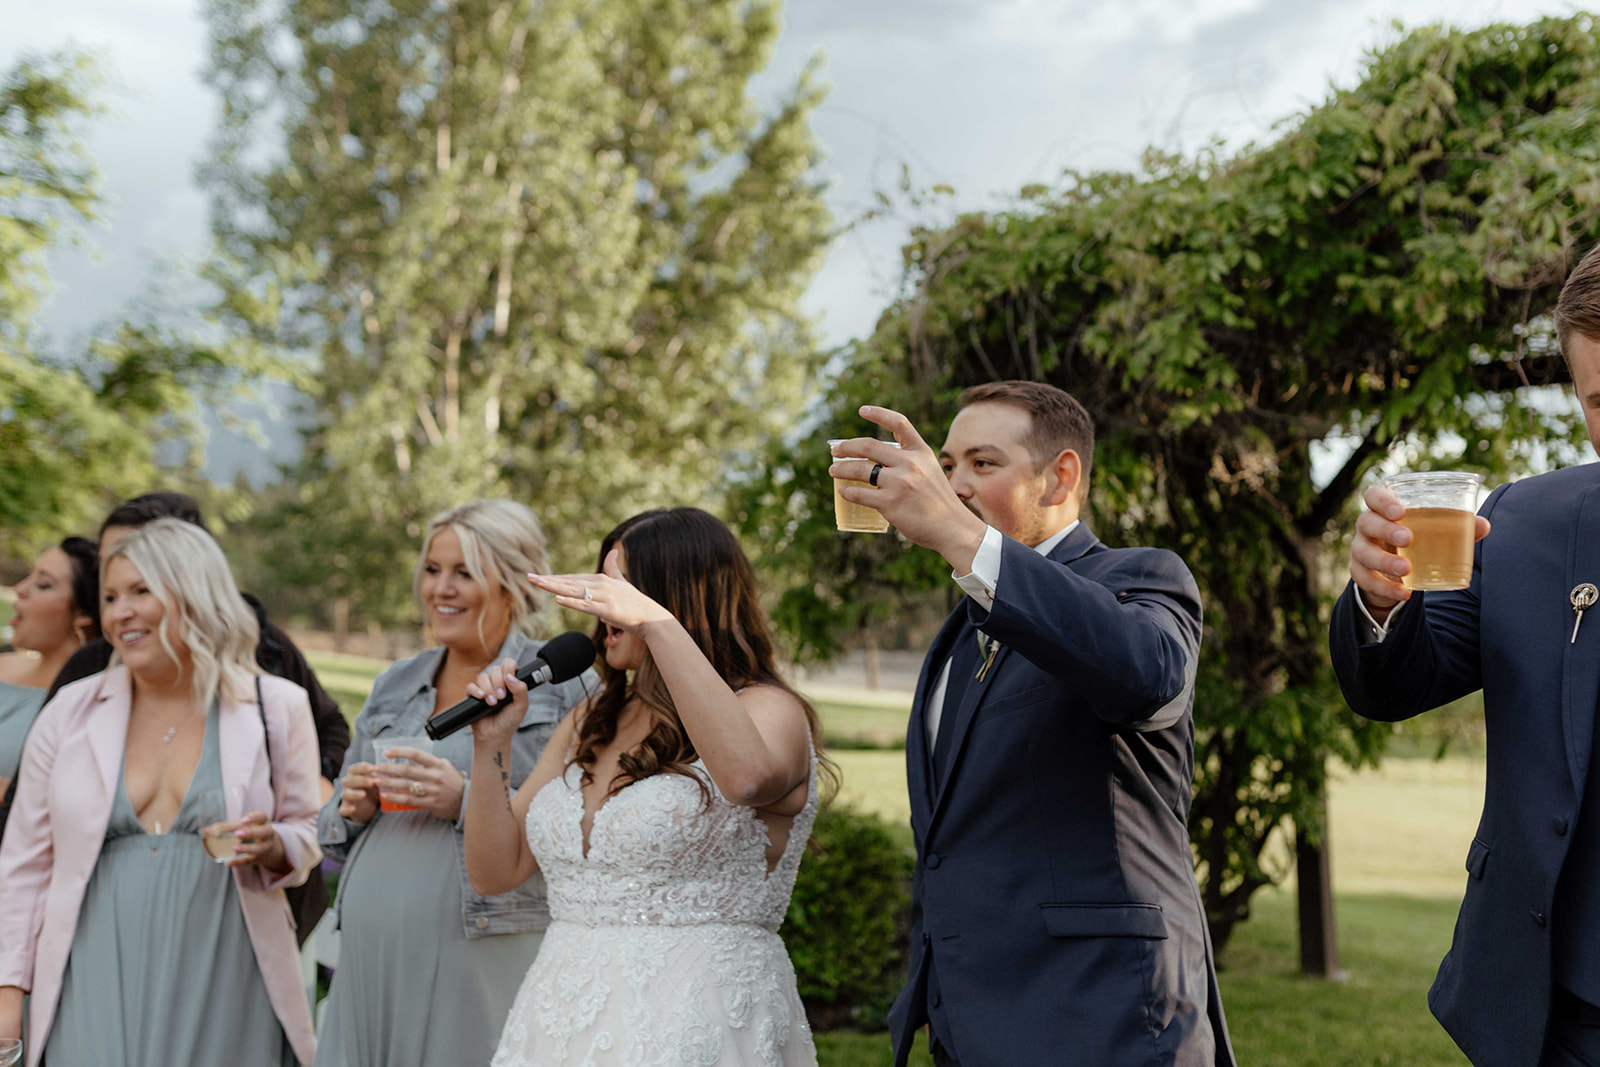 beacon hill wedding honest in ivory dress spokane speeches